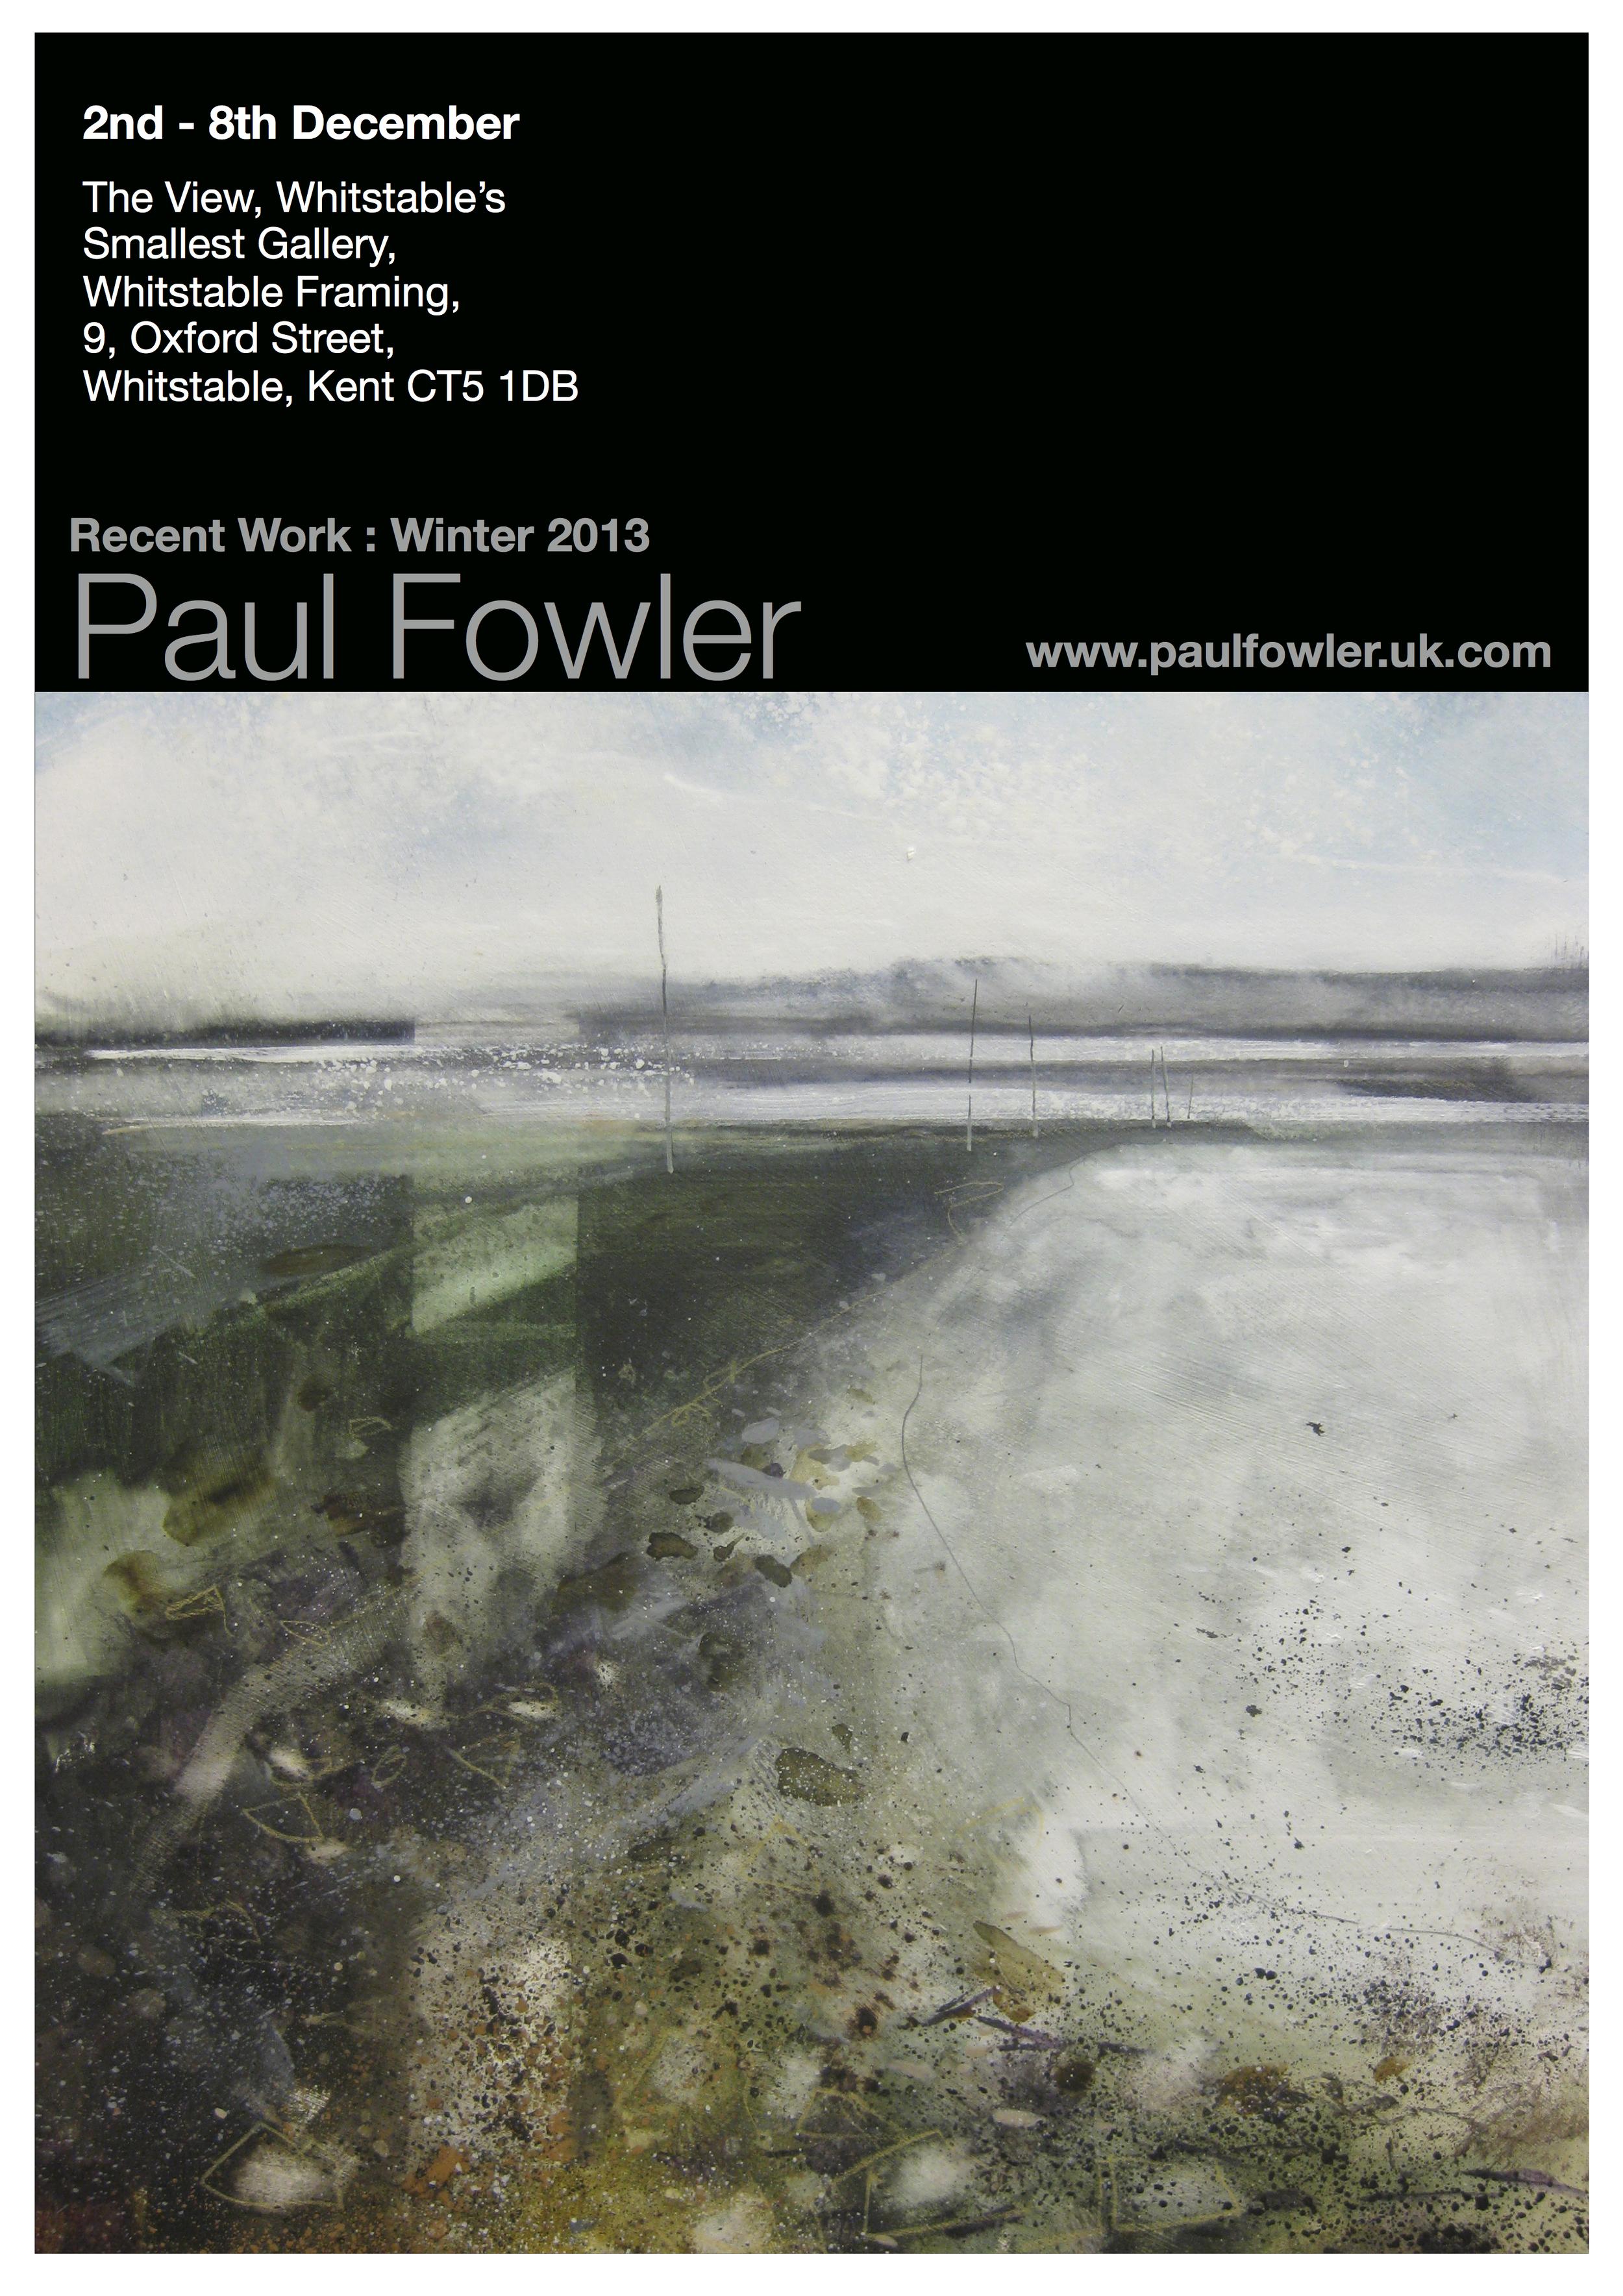 Backup of recent work poster - Winter 2013.jpg